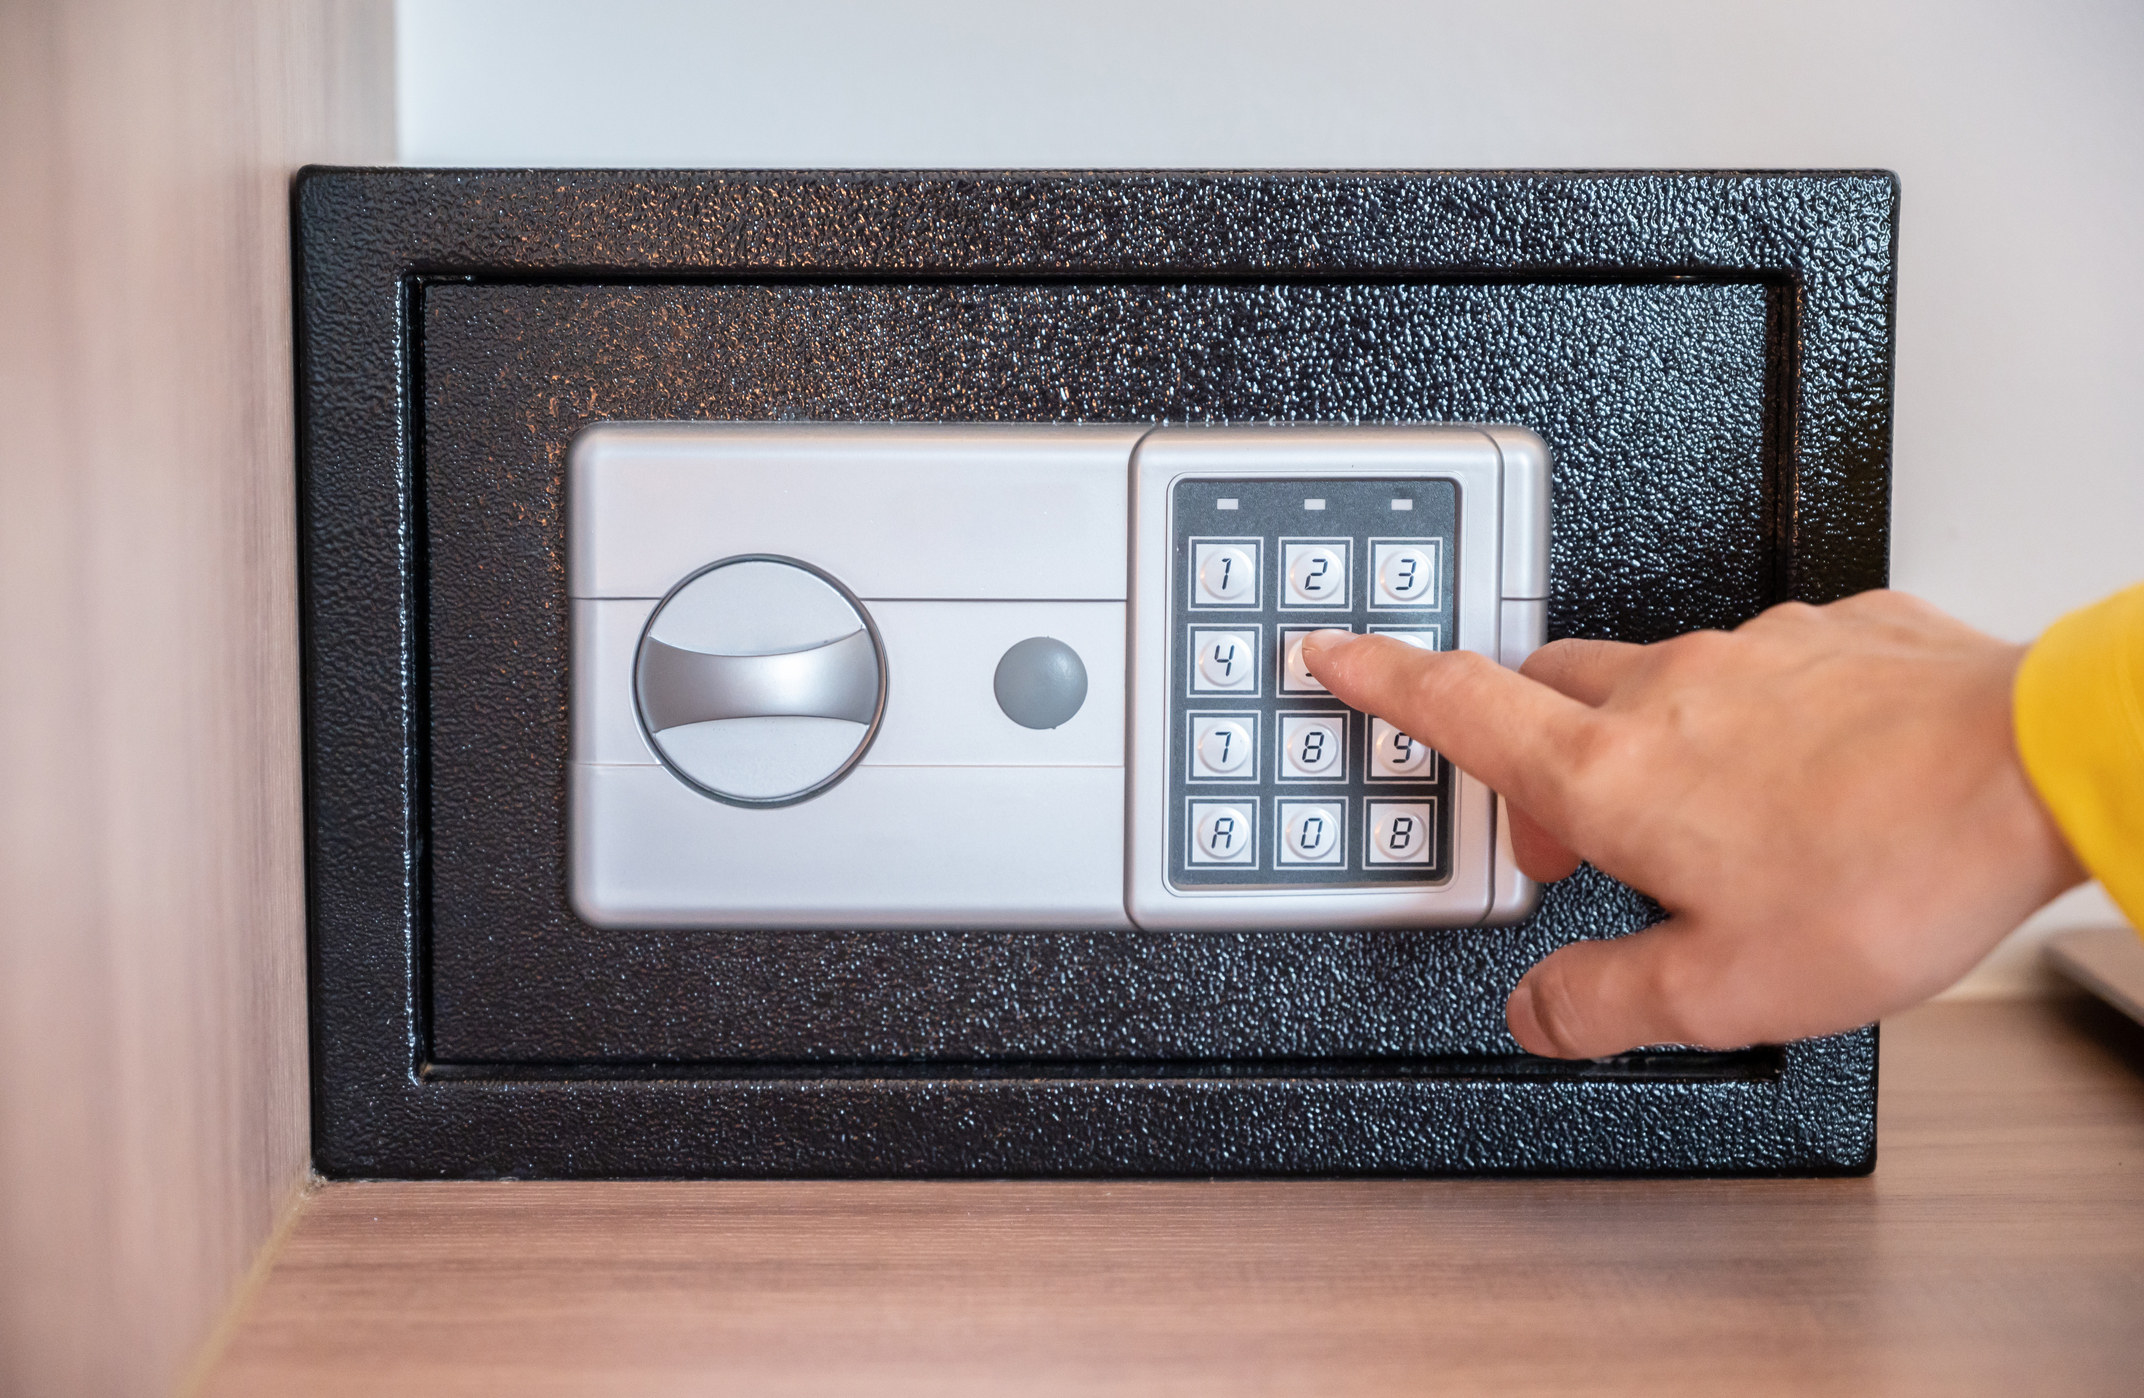 A hand entering a code into a hotel safe.